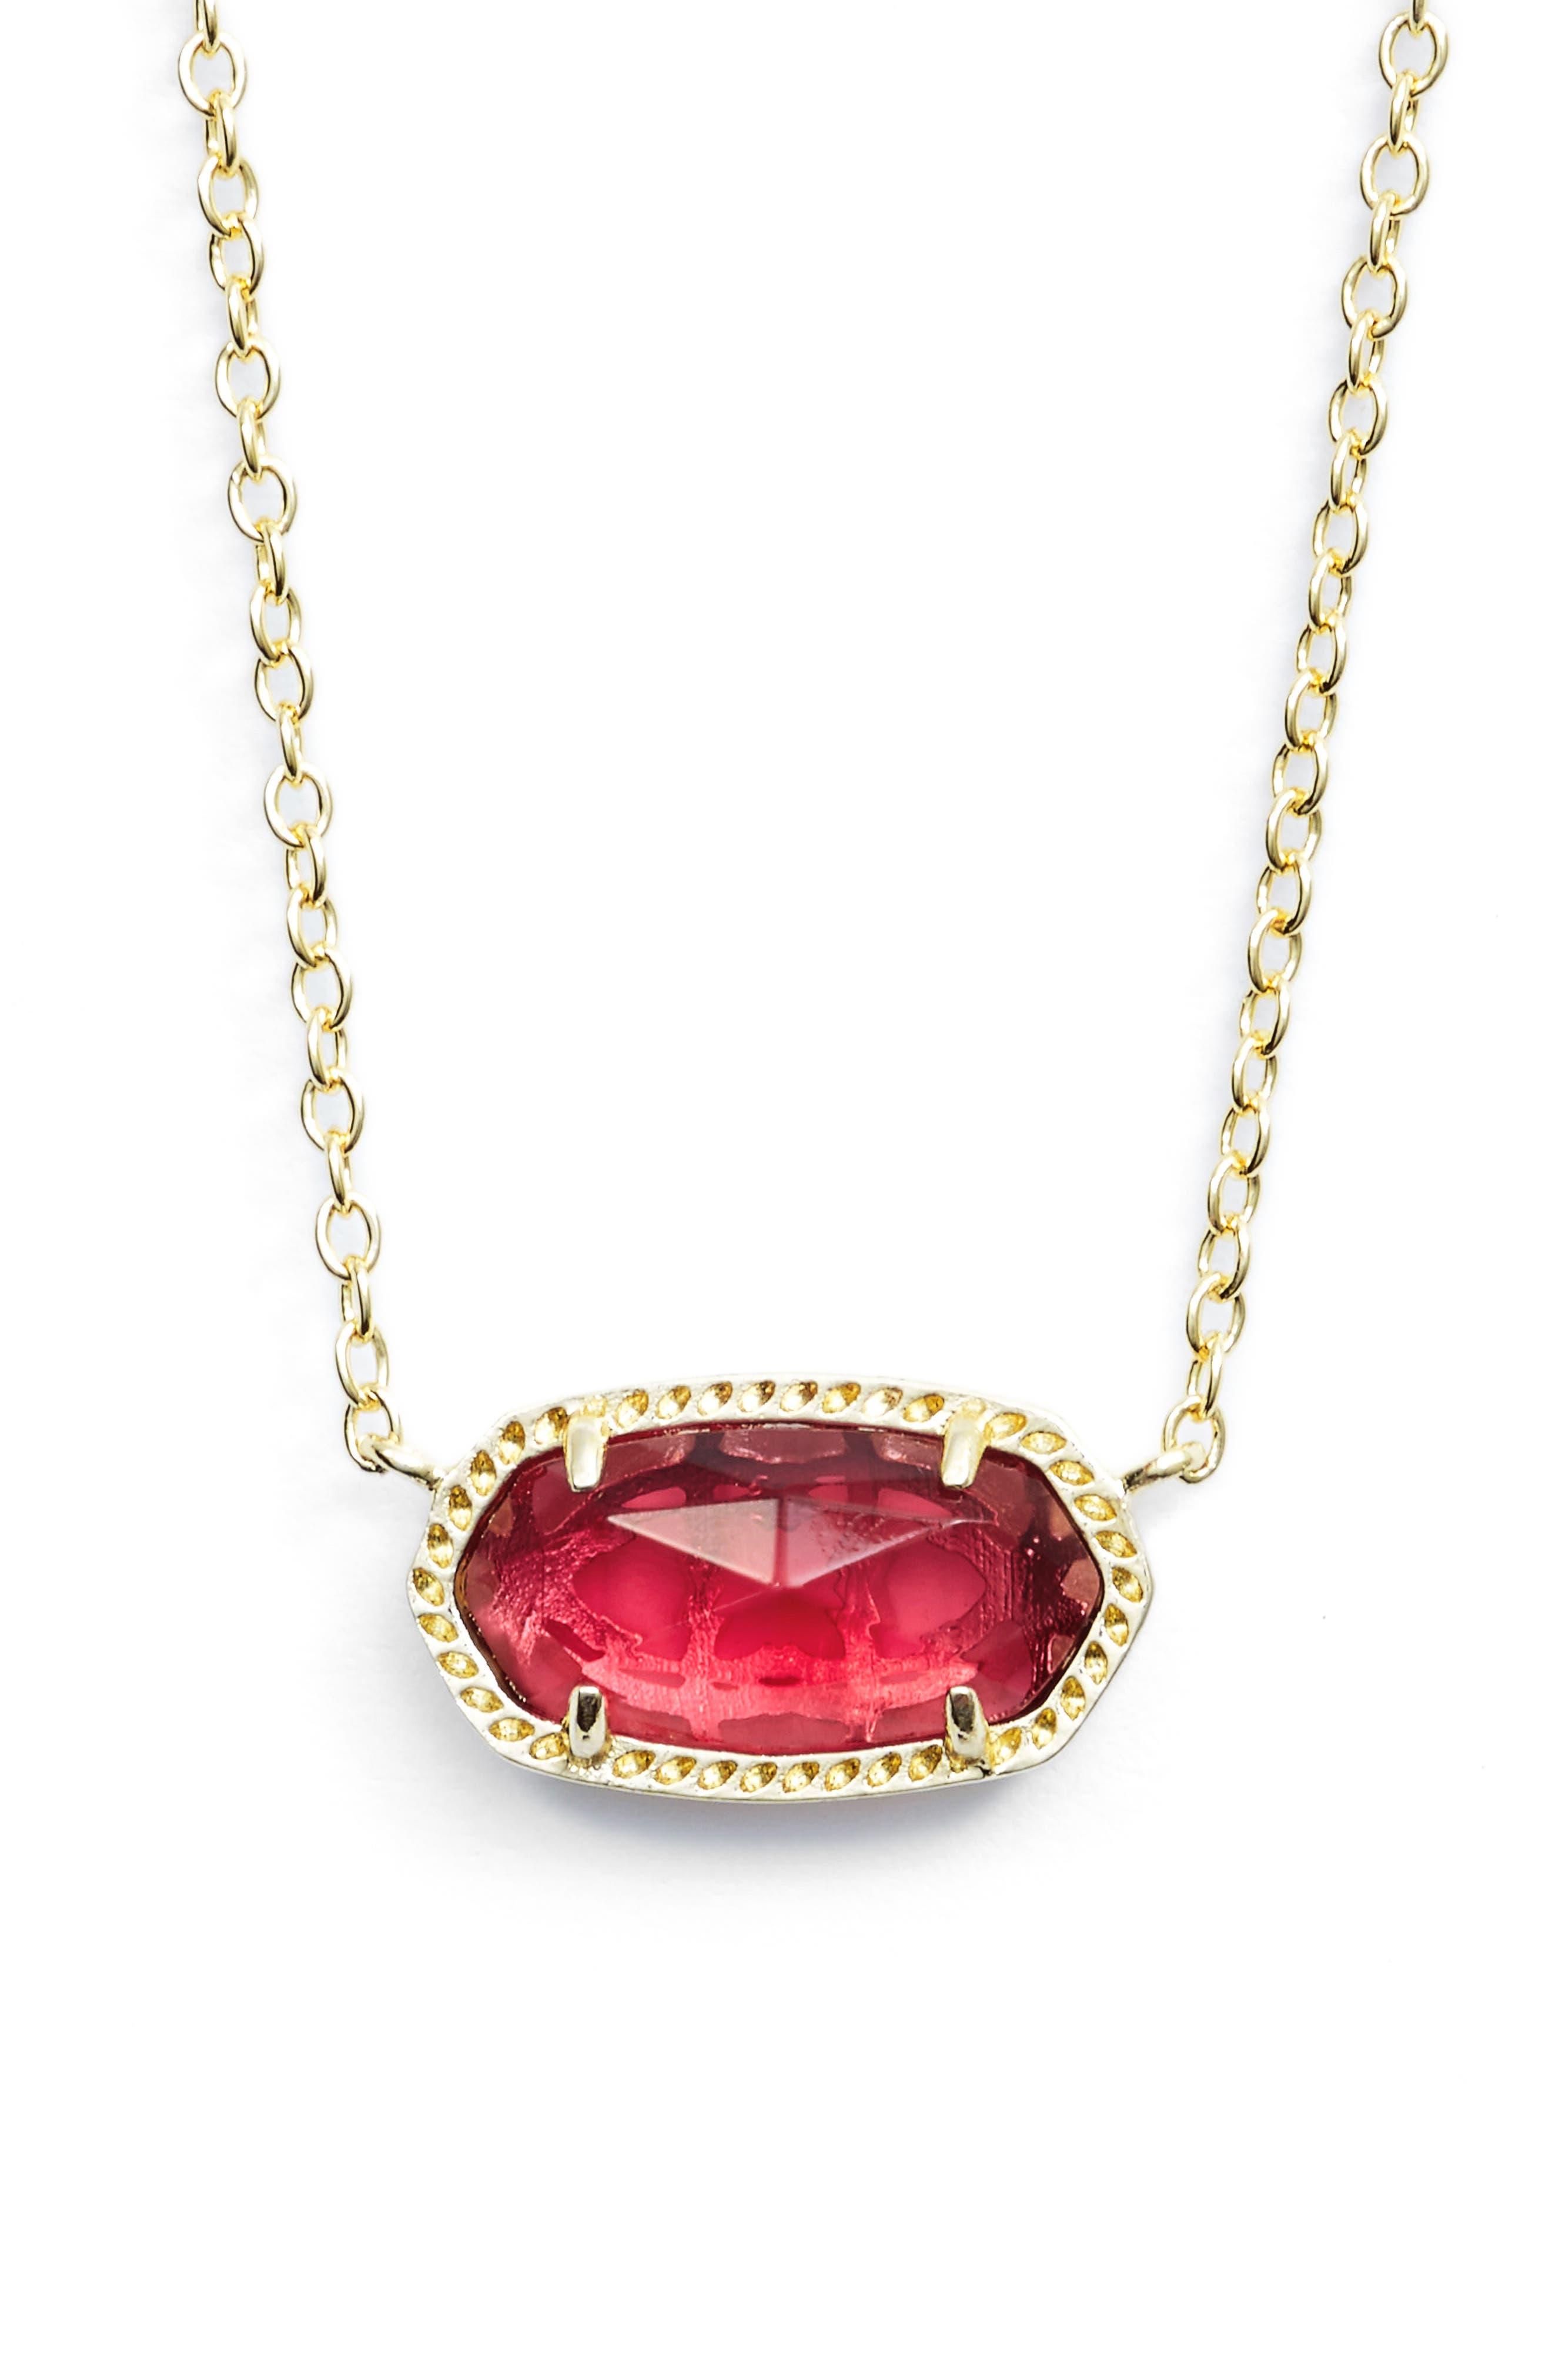 KENDRA SCOTT Elisa Birthstone Pendant Necklace, Main, color, JANUARY/BERRY/GOLD